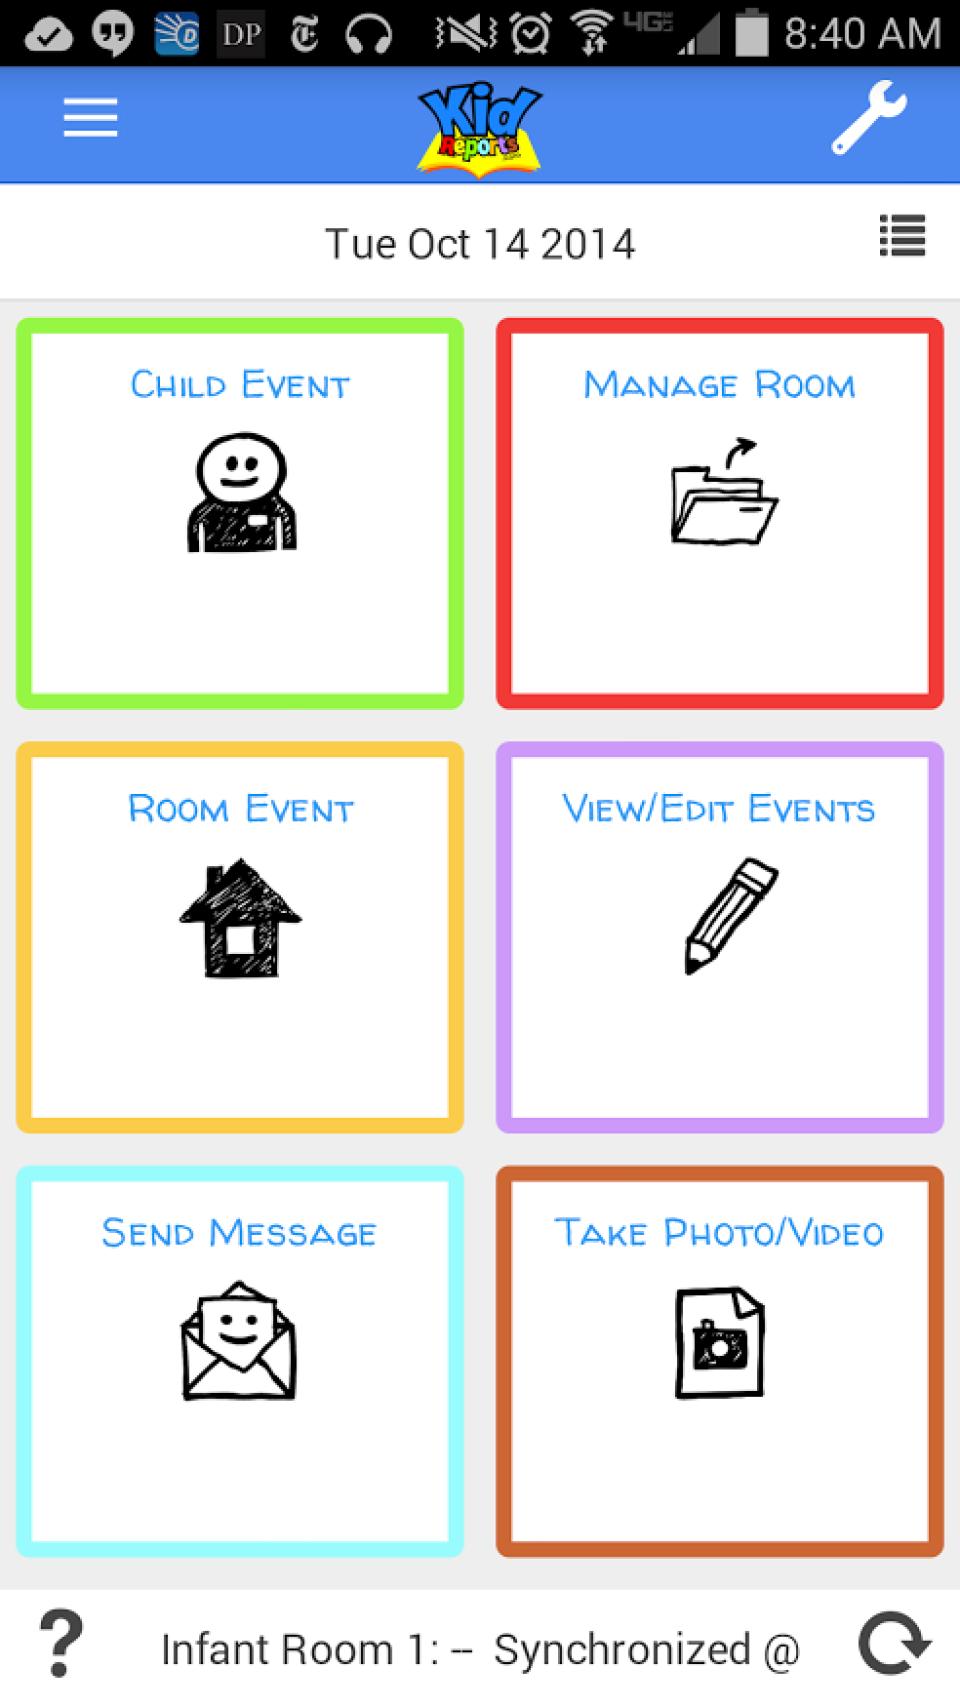 KidReports-screenshot-2